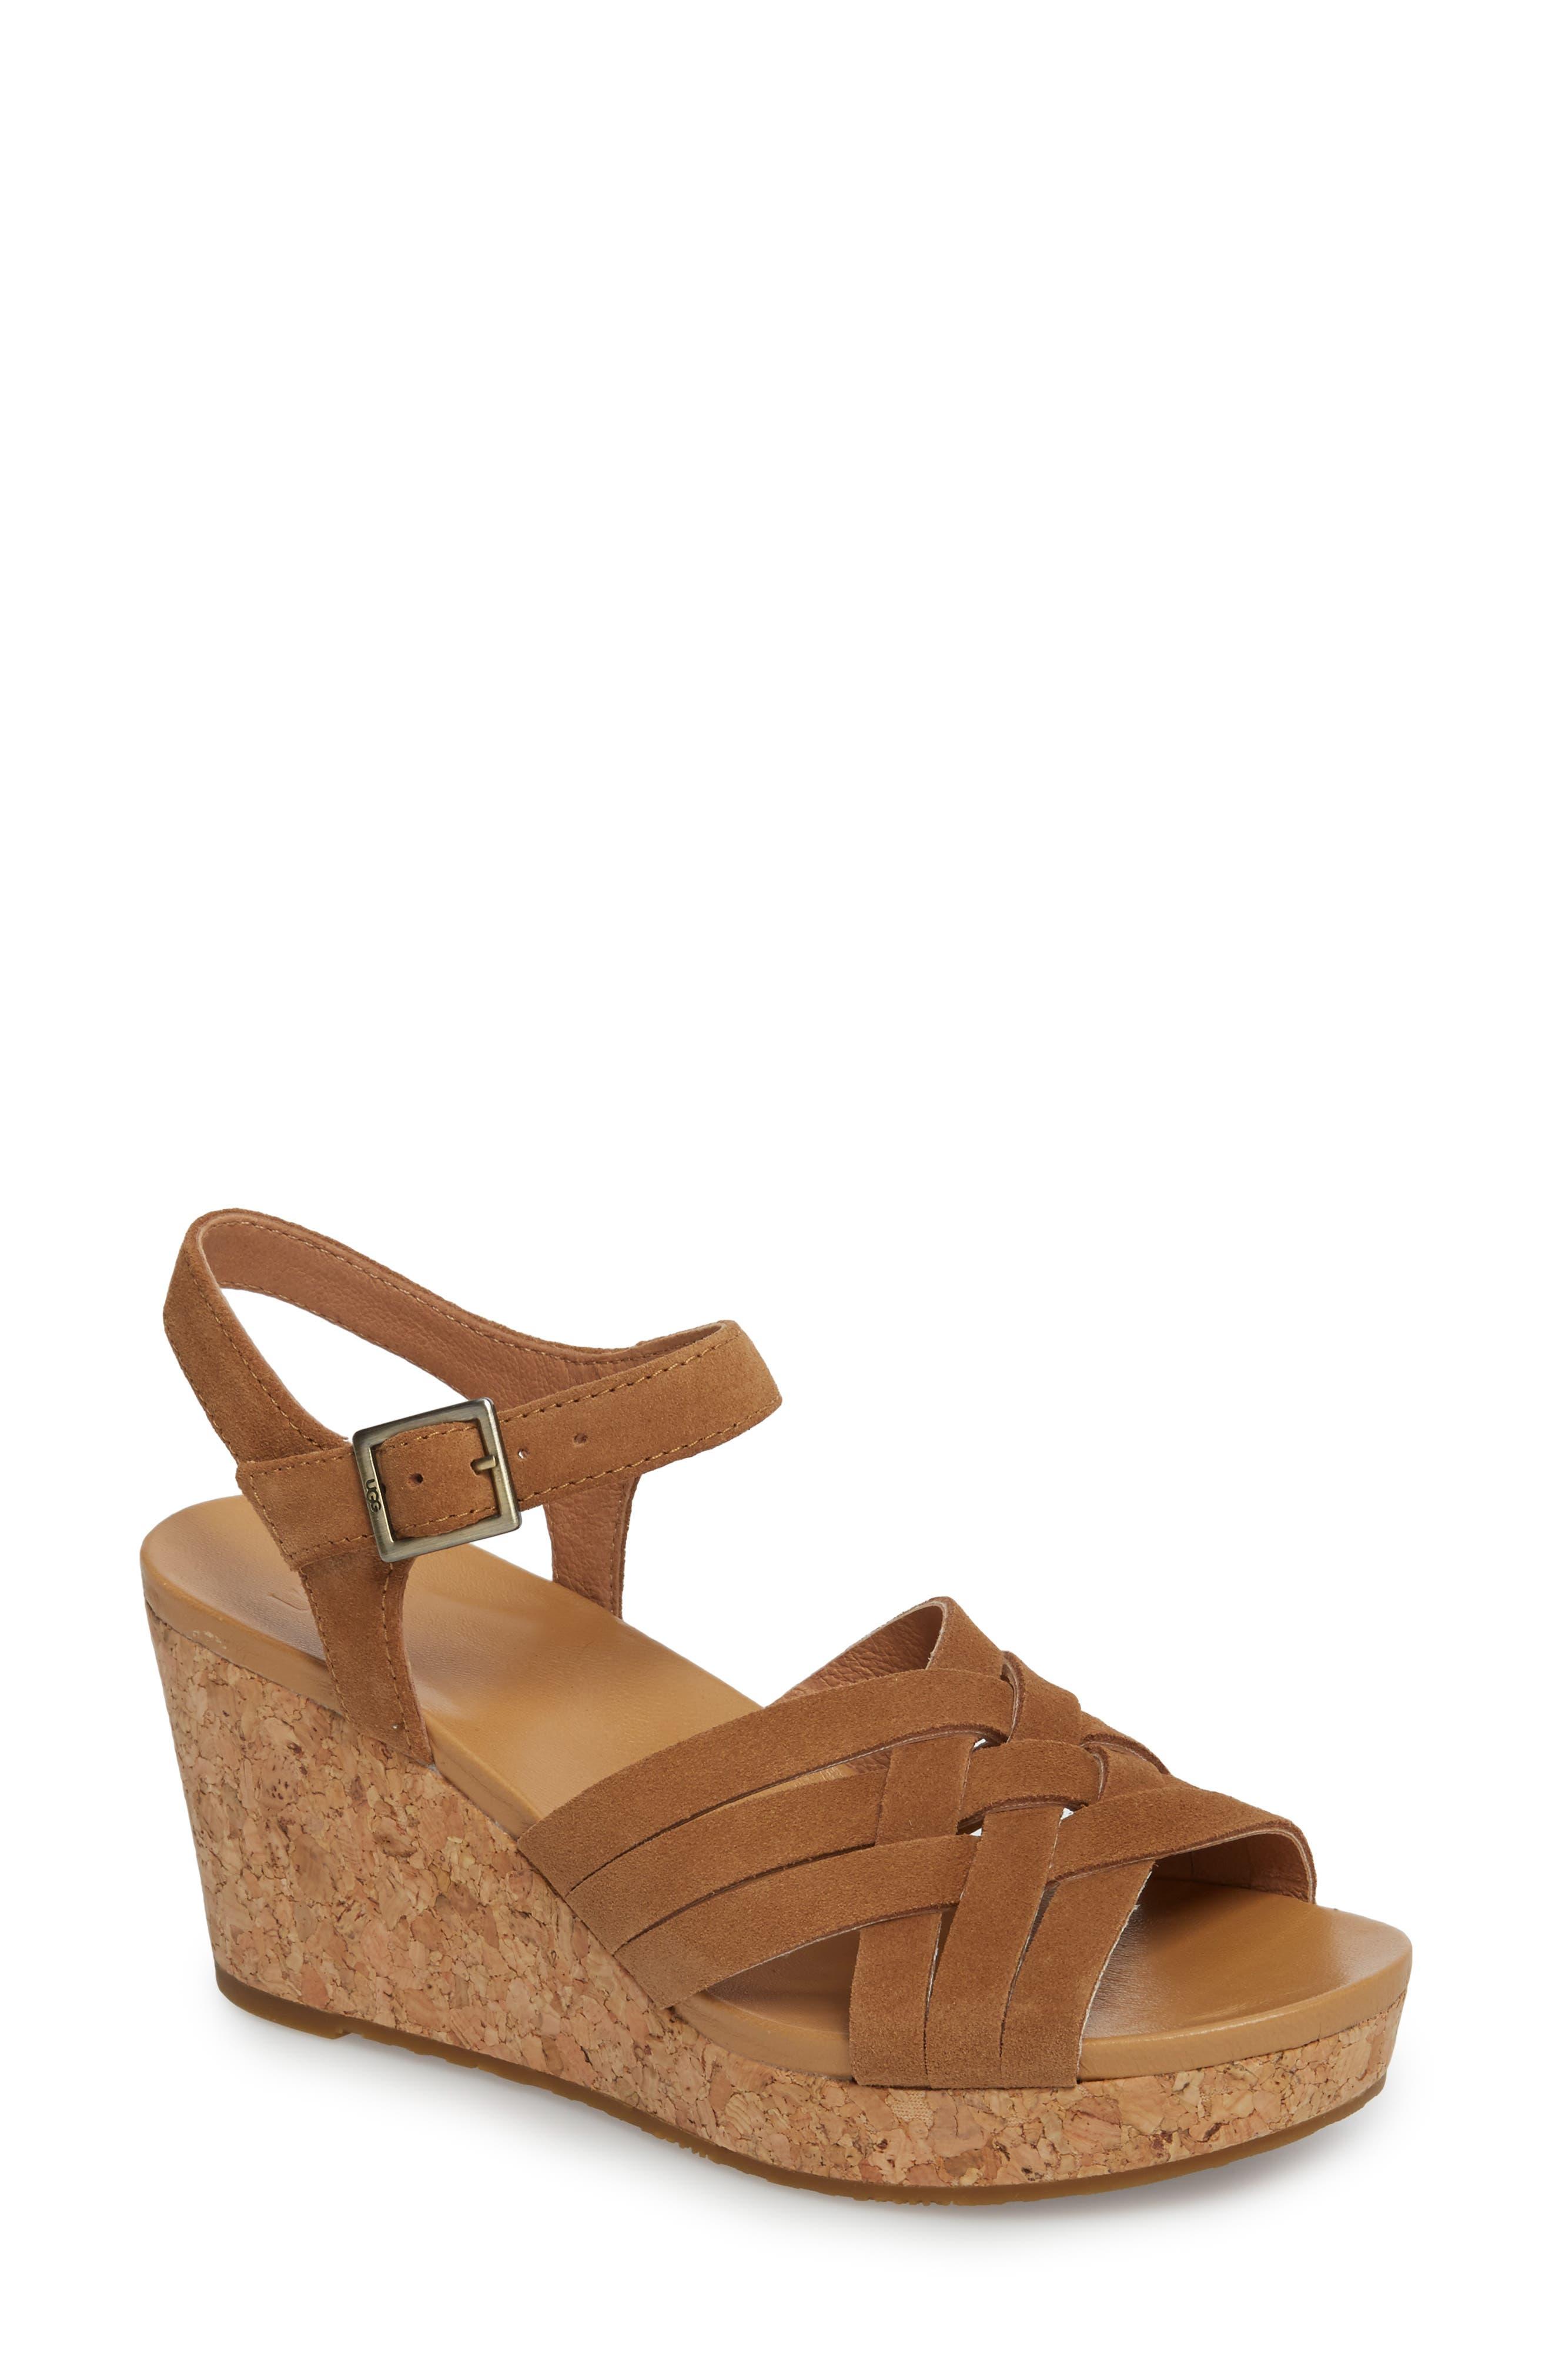 Uma Wedge Sandal,                             Main thumbnail 1, color,                             Chestnut Suede